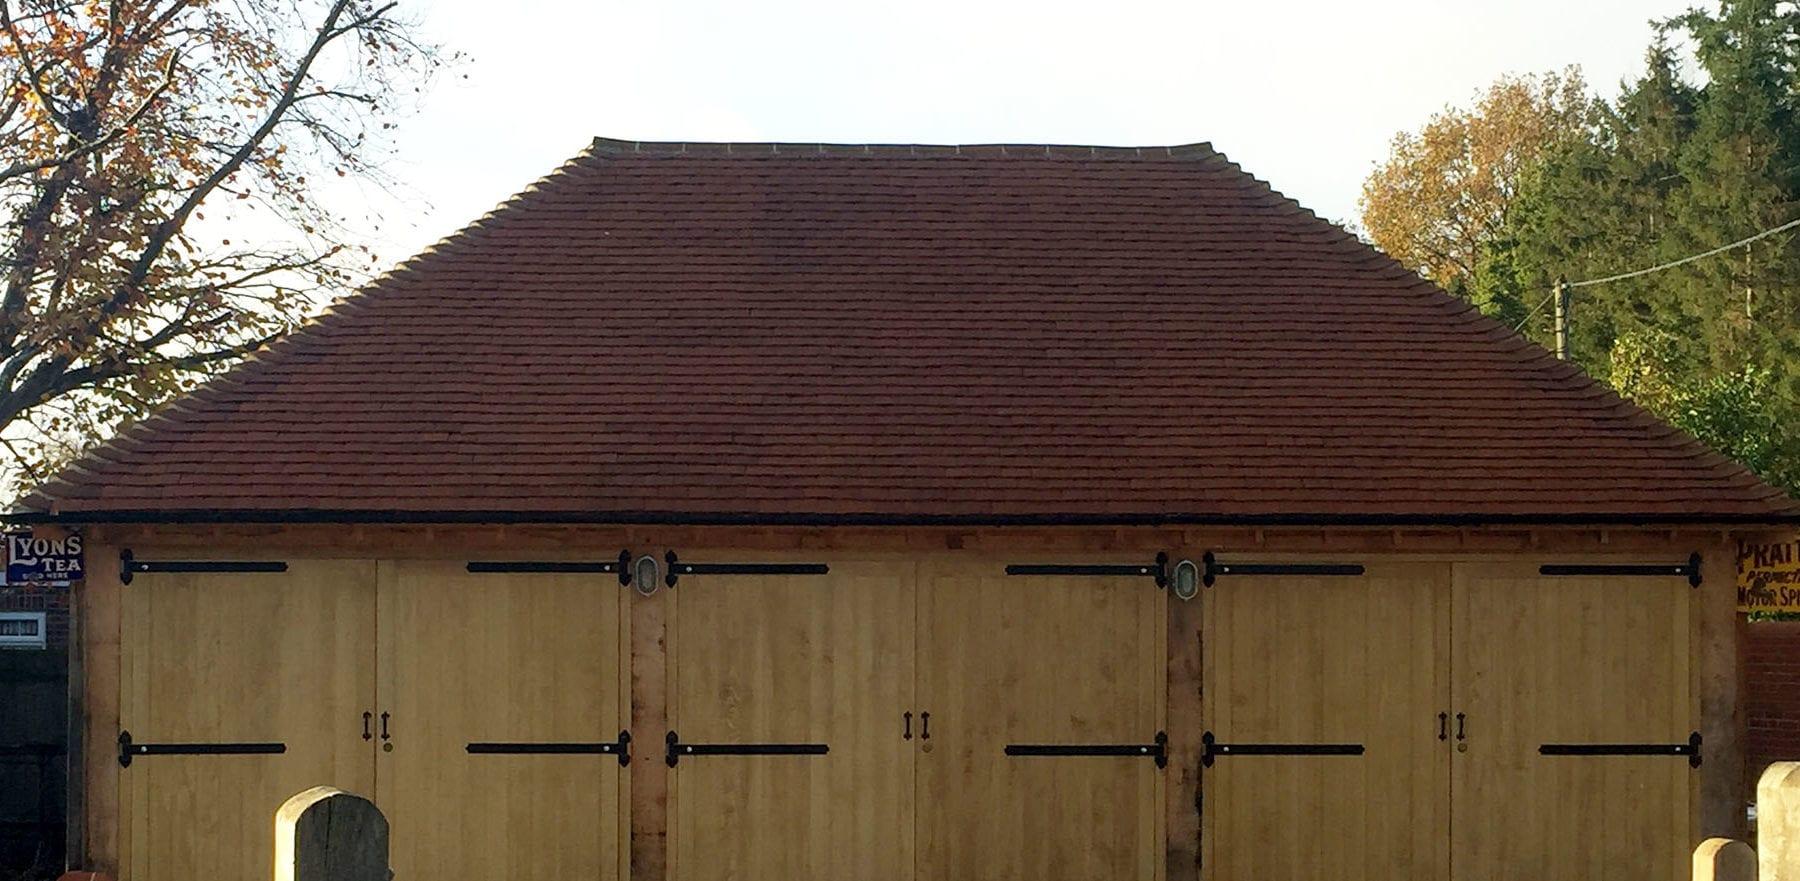 Lifestiles - Handmade Orange Clay Roof Tiles - Bramley, England